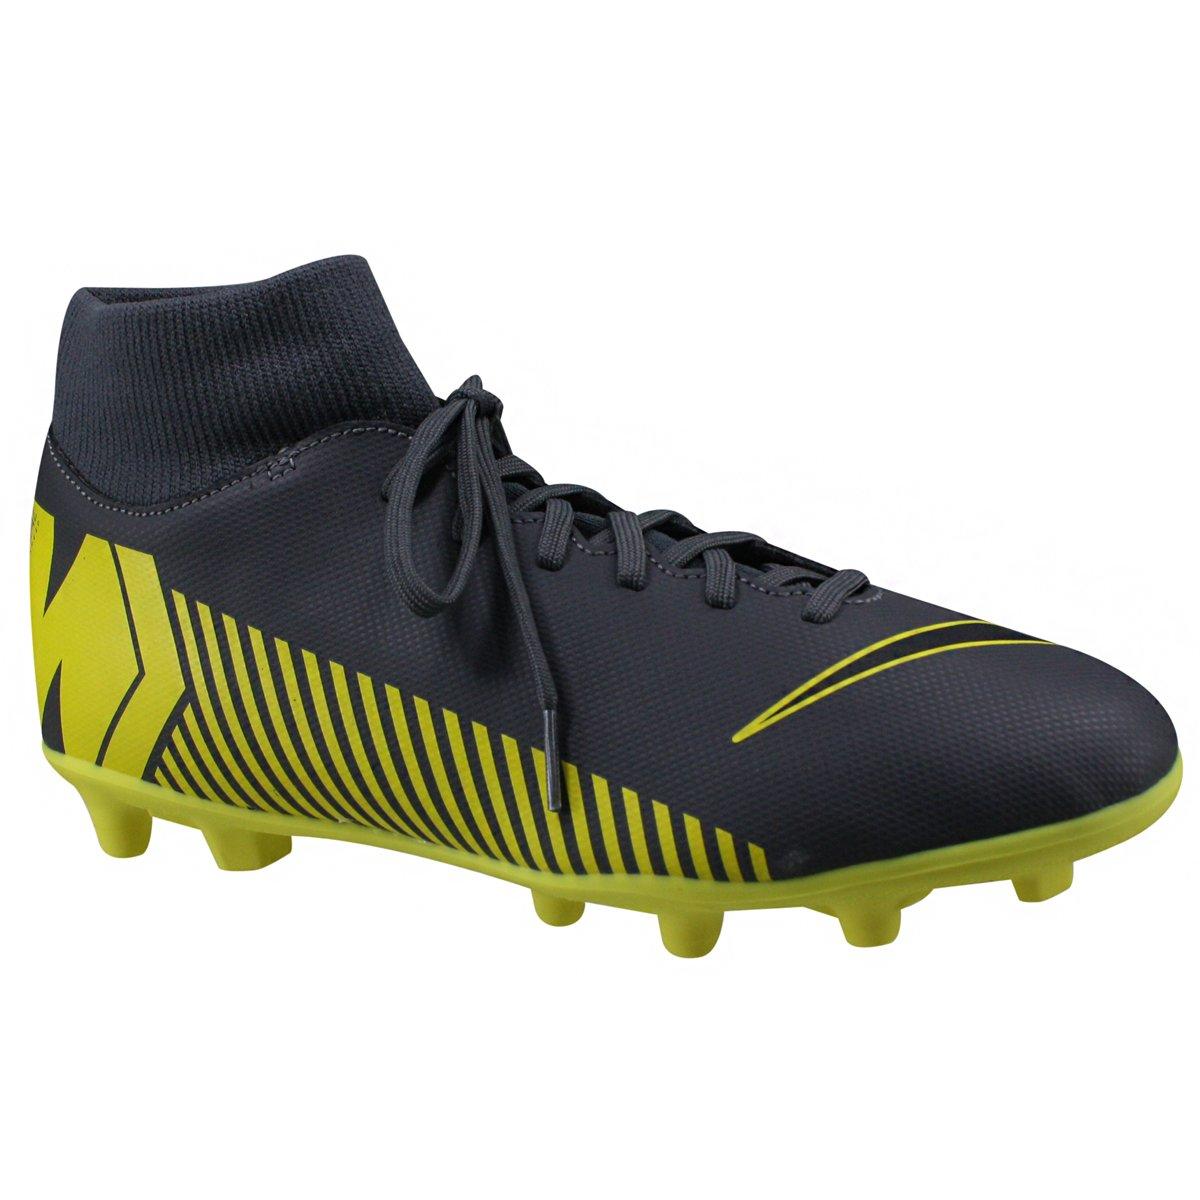 Chuteira Campo Nike Mercurial Superfly 6 Club AH7363-070 Cinza Amarelo ab23927463218